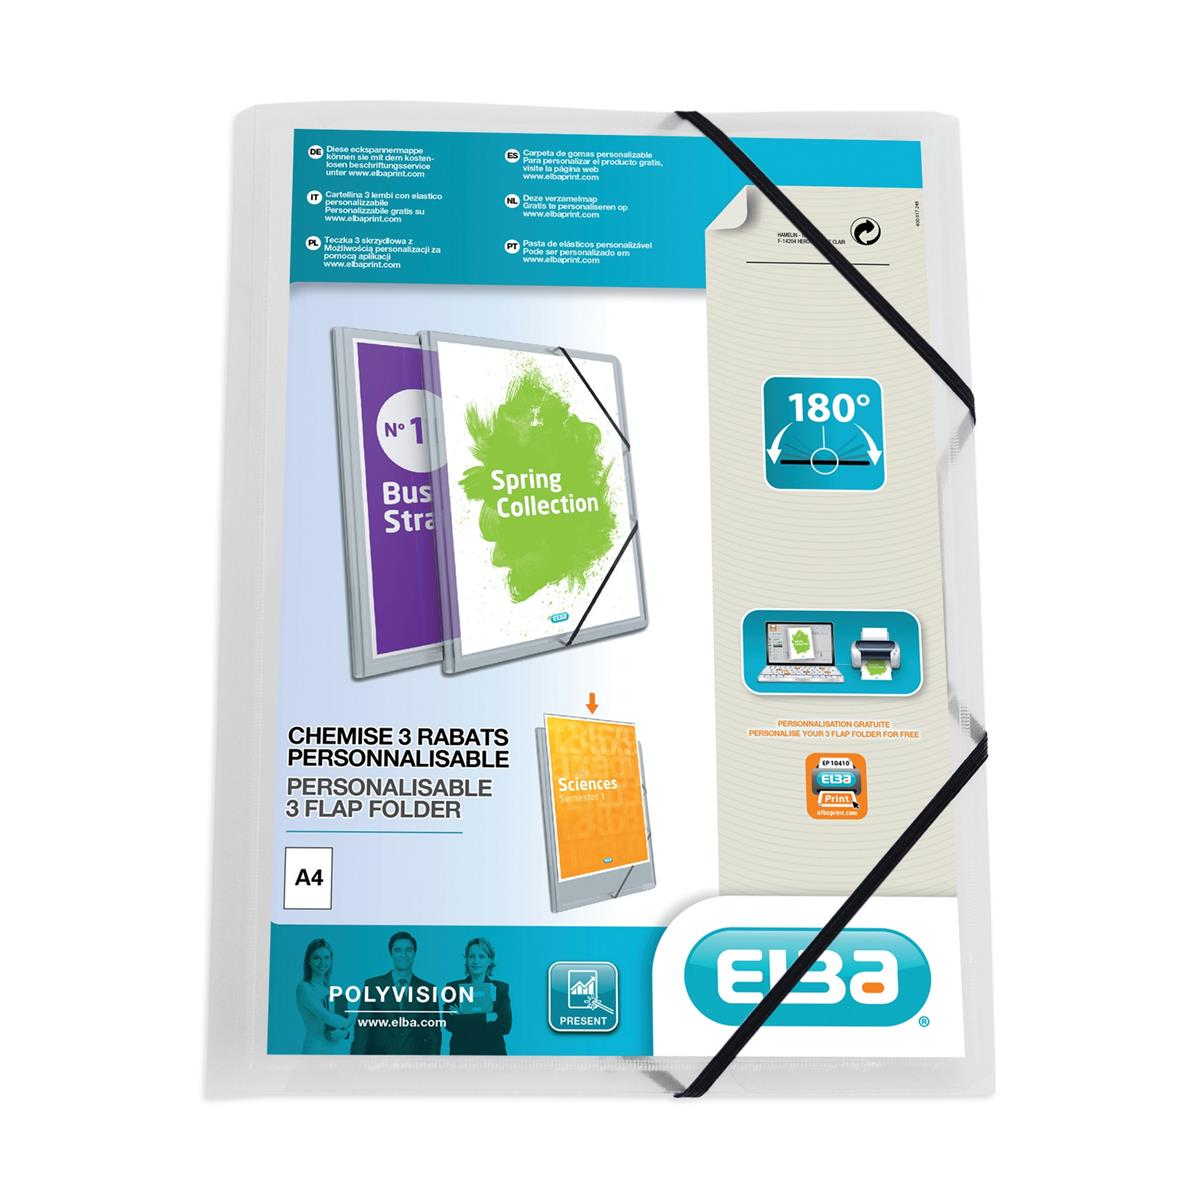 Elba Polyvision Elasticated Folder 3-Flap Polypropylene A4 Clear Ref 100201153 [Pack 12]